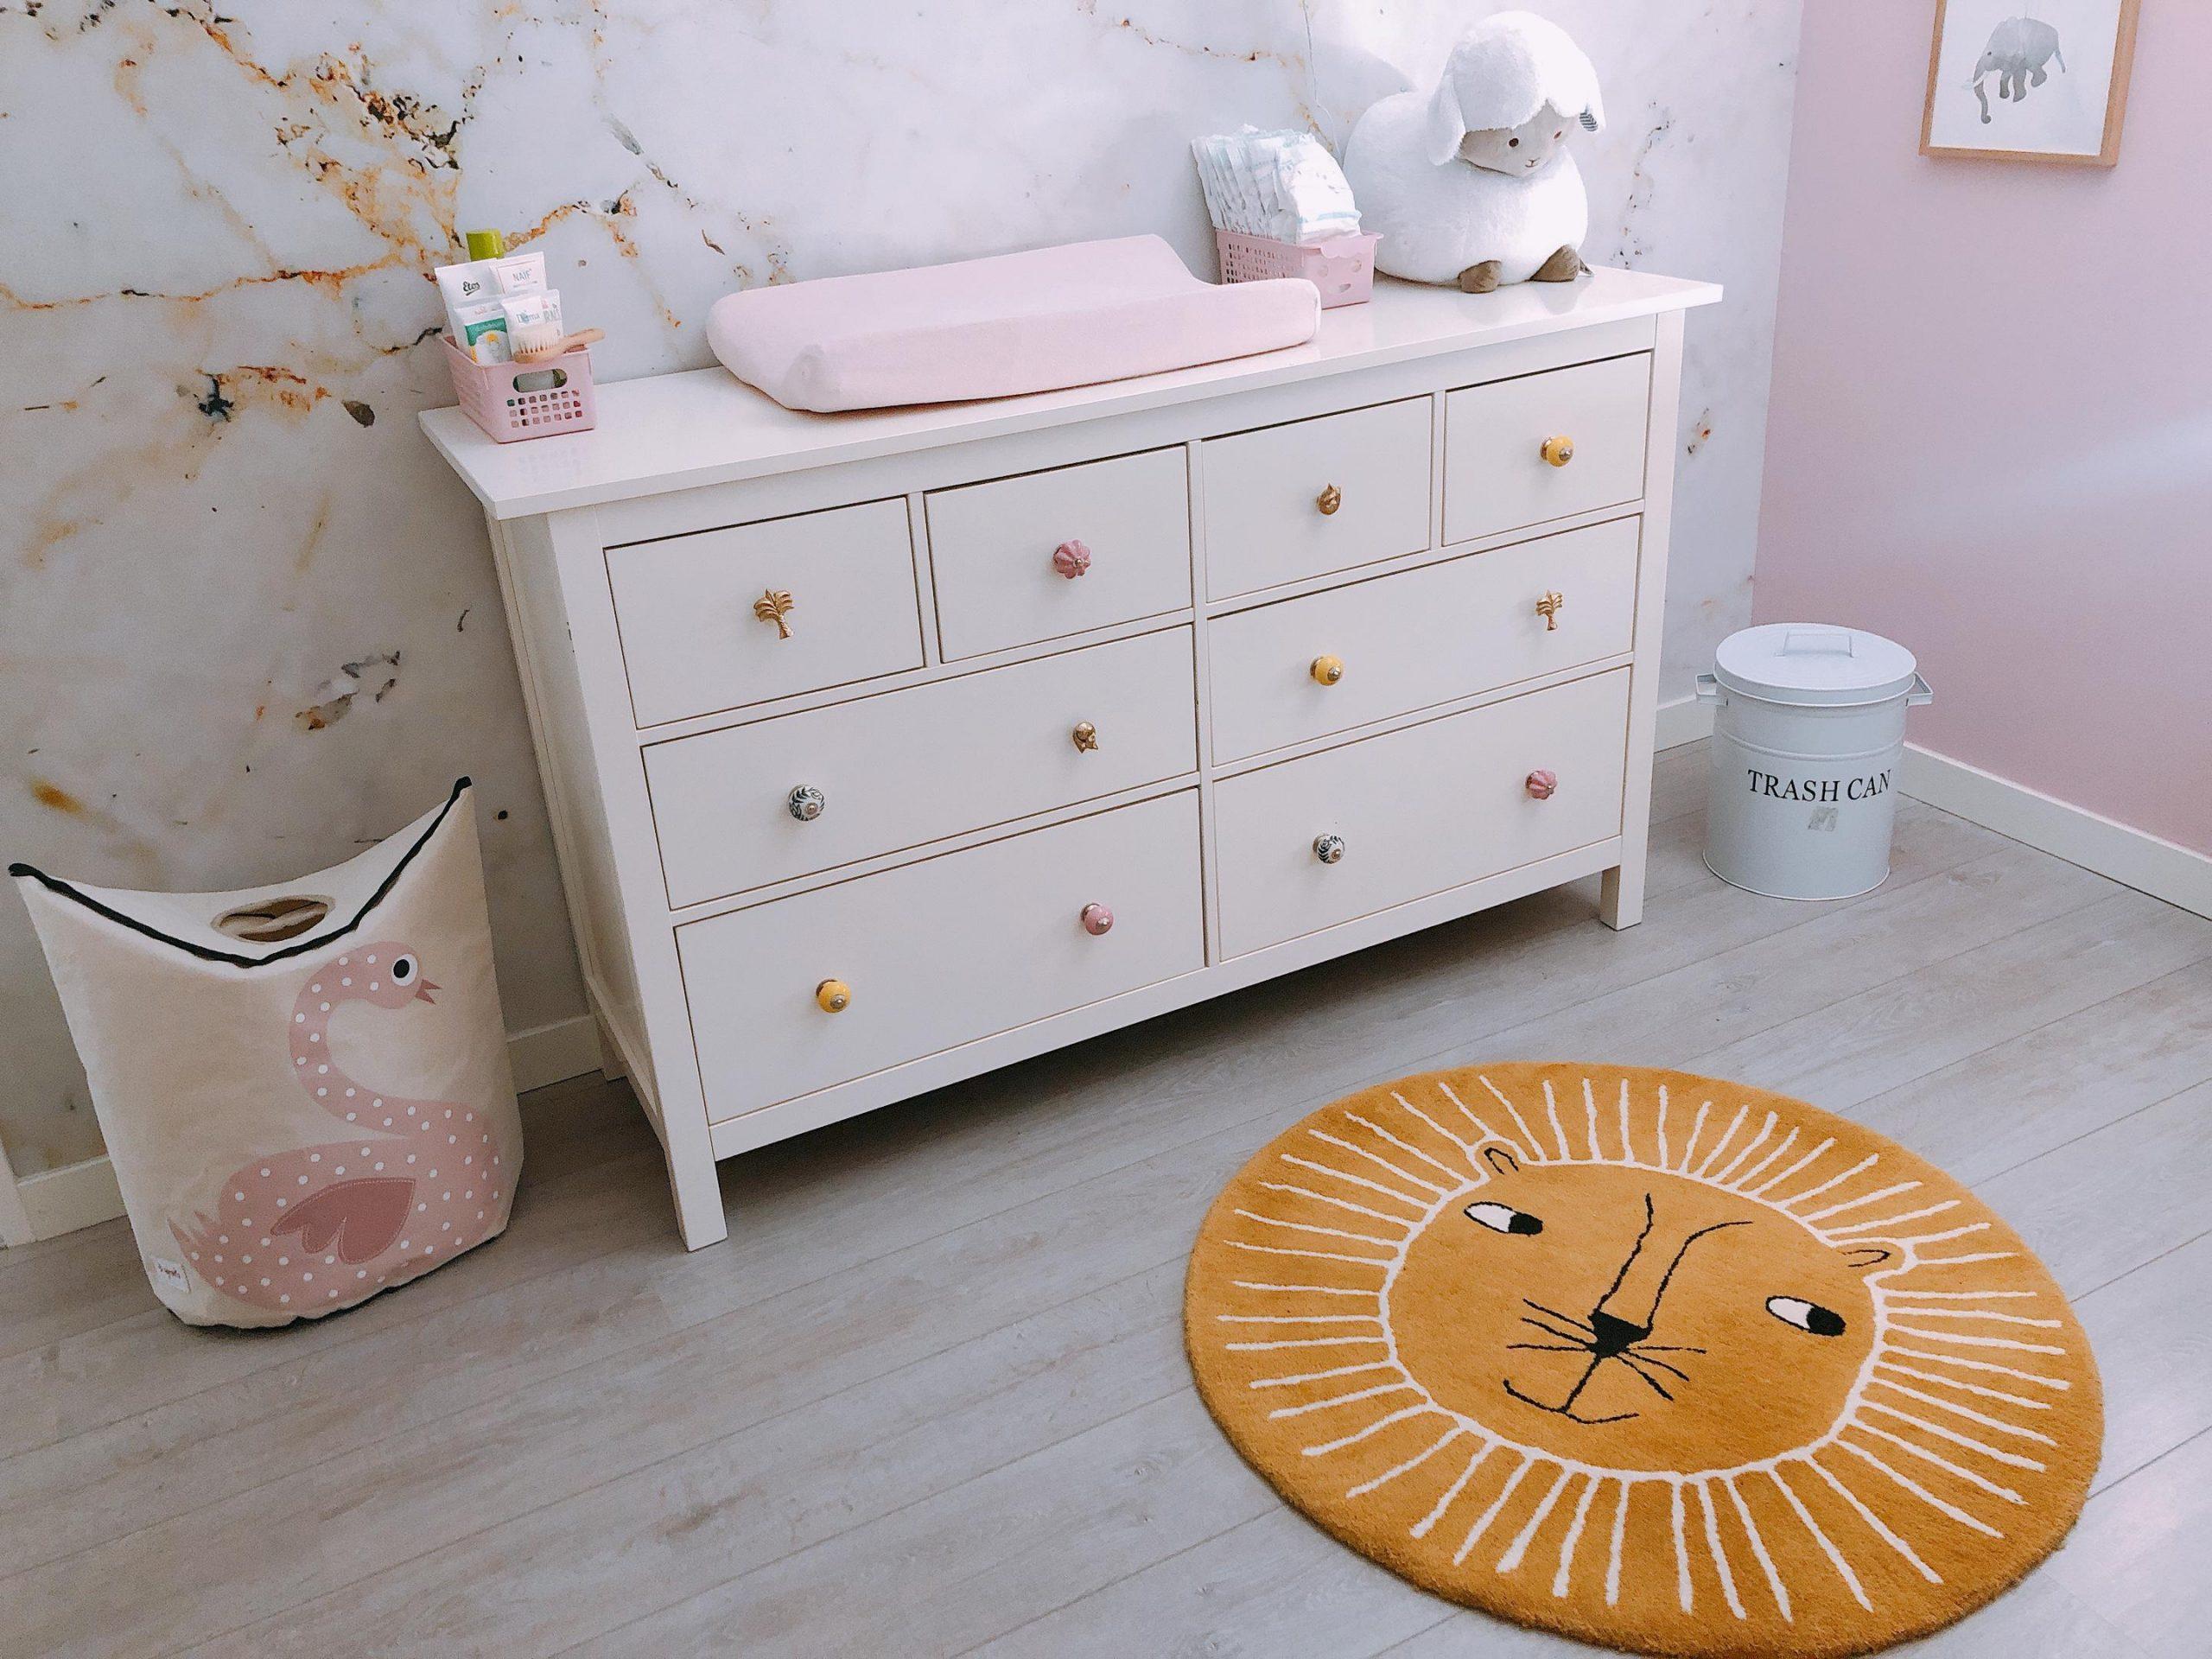 IMG 6900 2880x2160 1 scaled - De baby/kinderkamer van Hazel - roze, hout & marmer!